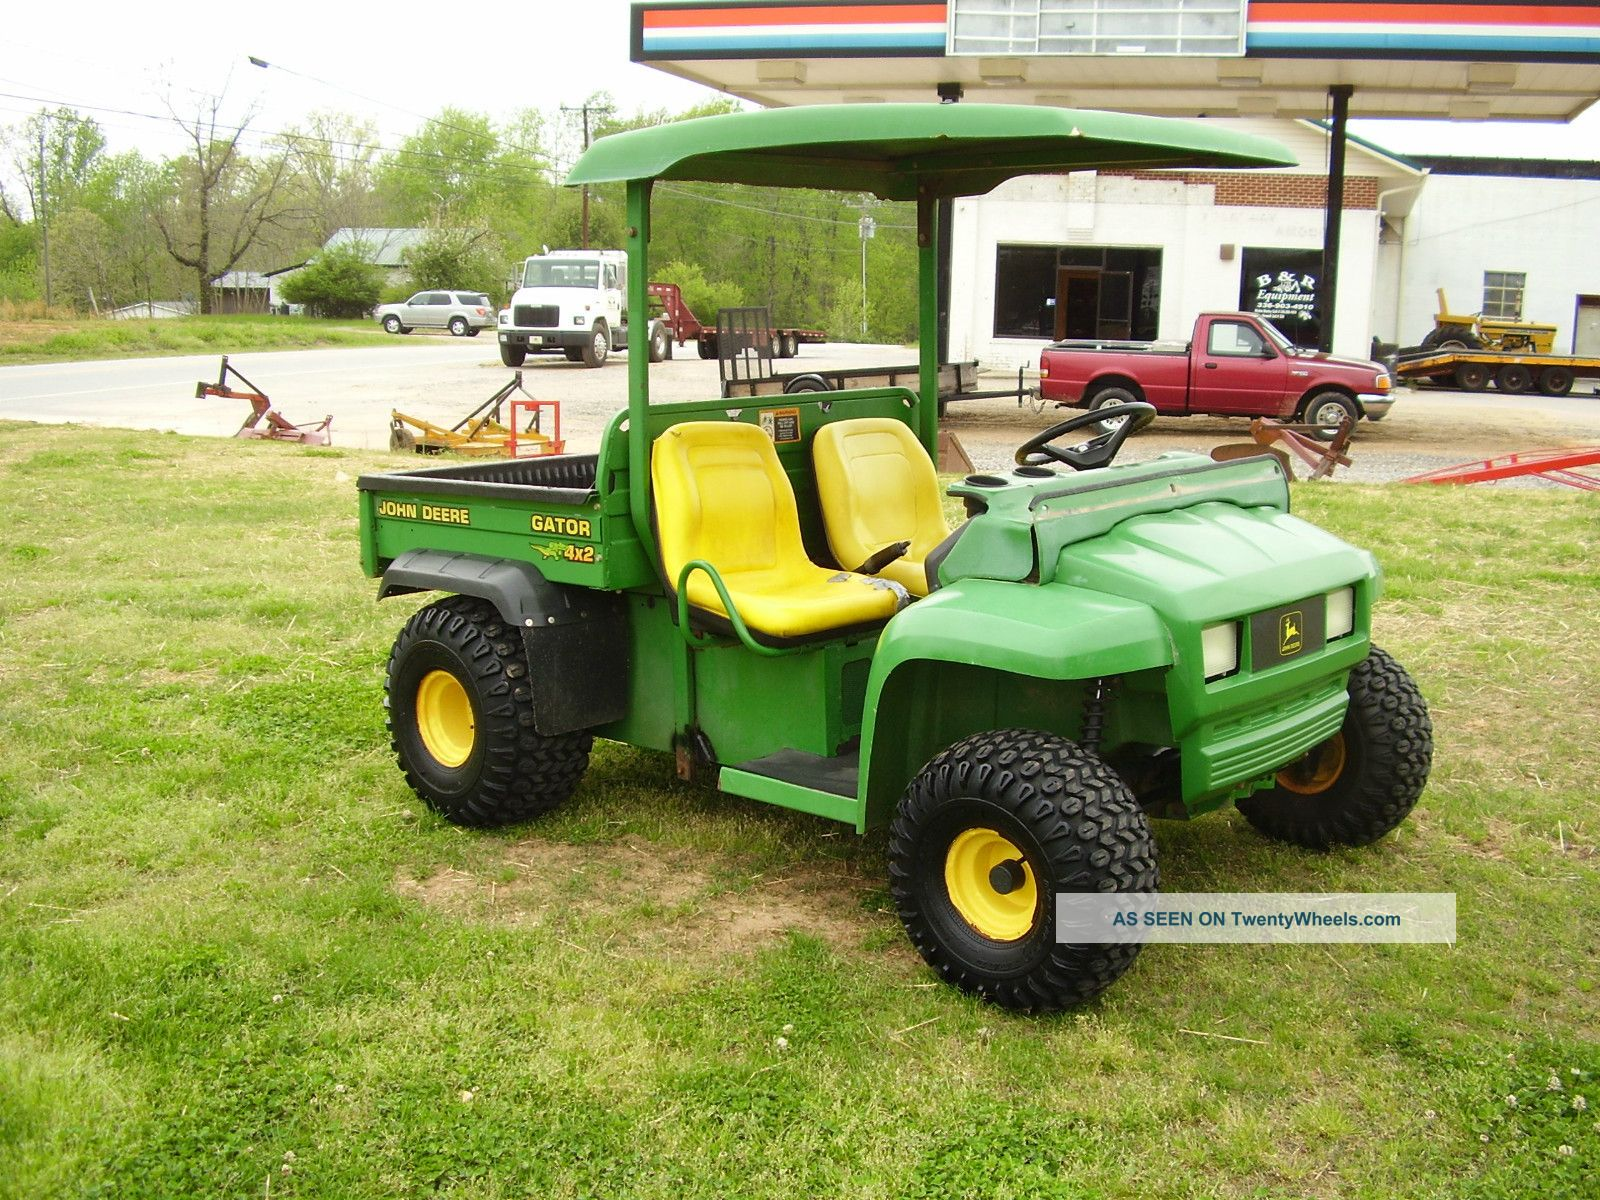 John Deere 4 X 2 Gator Runs Good Tractors photo